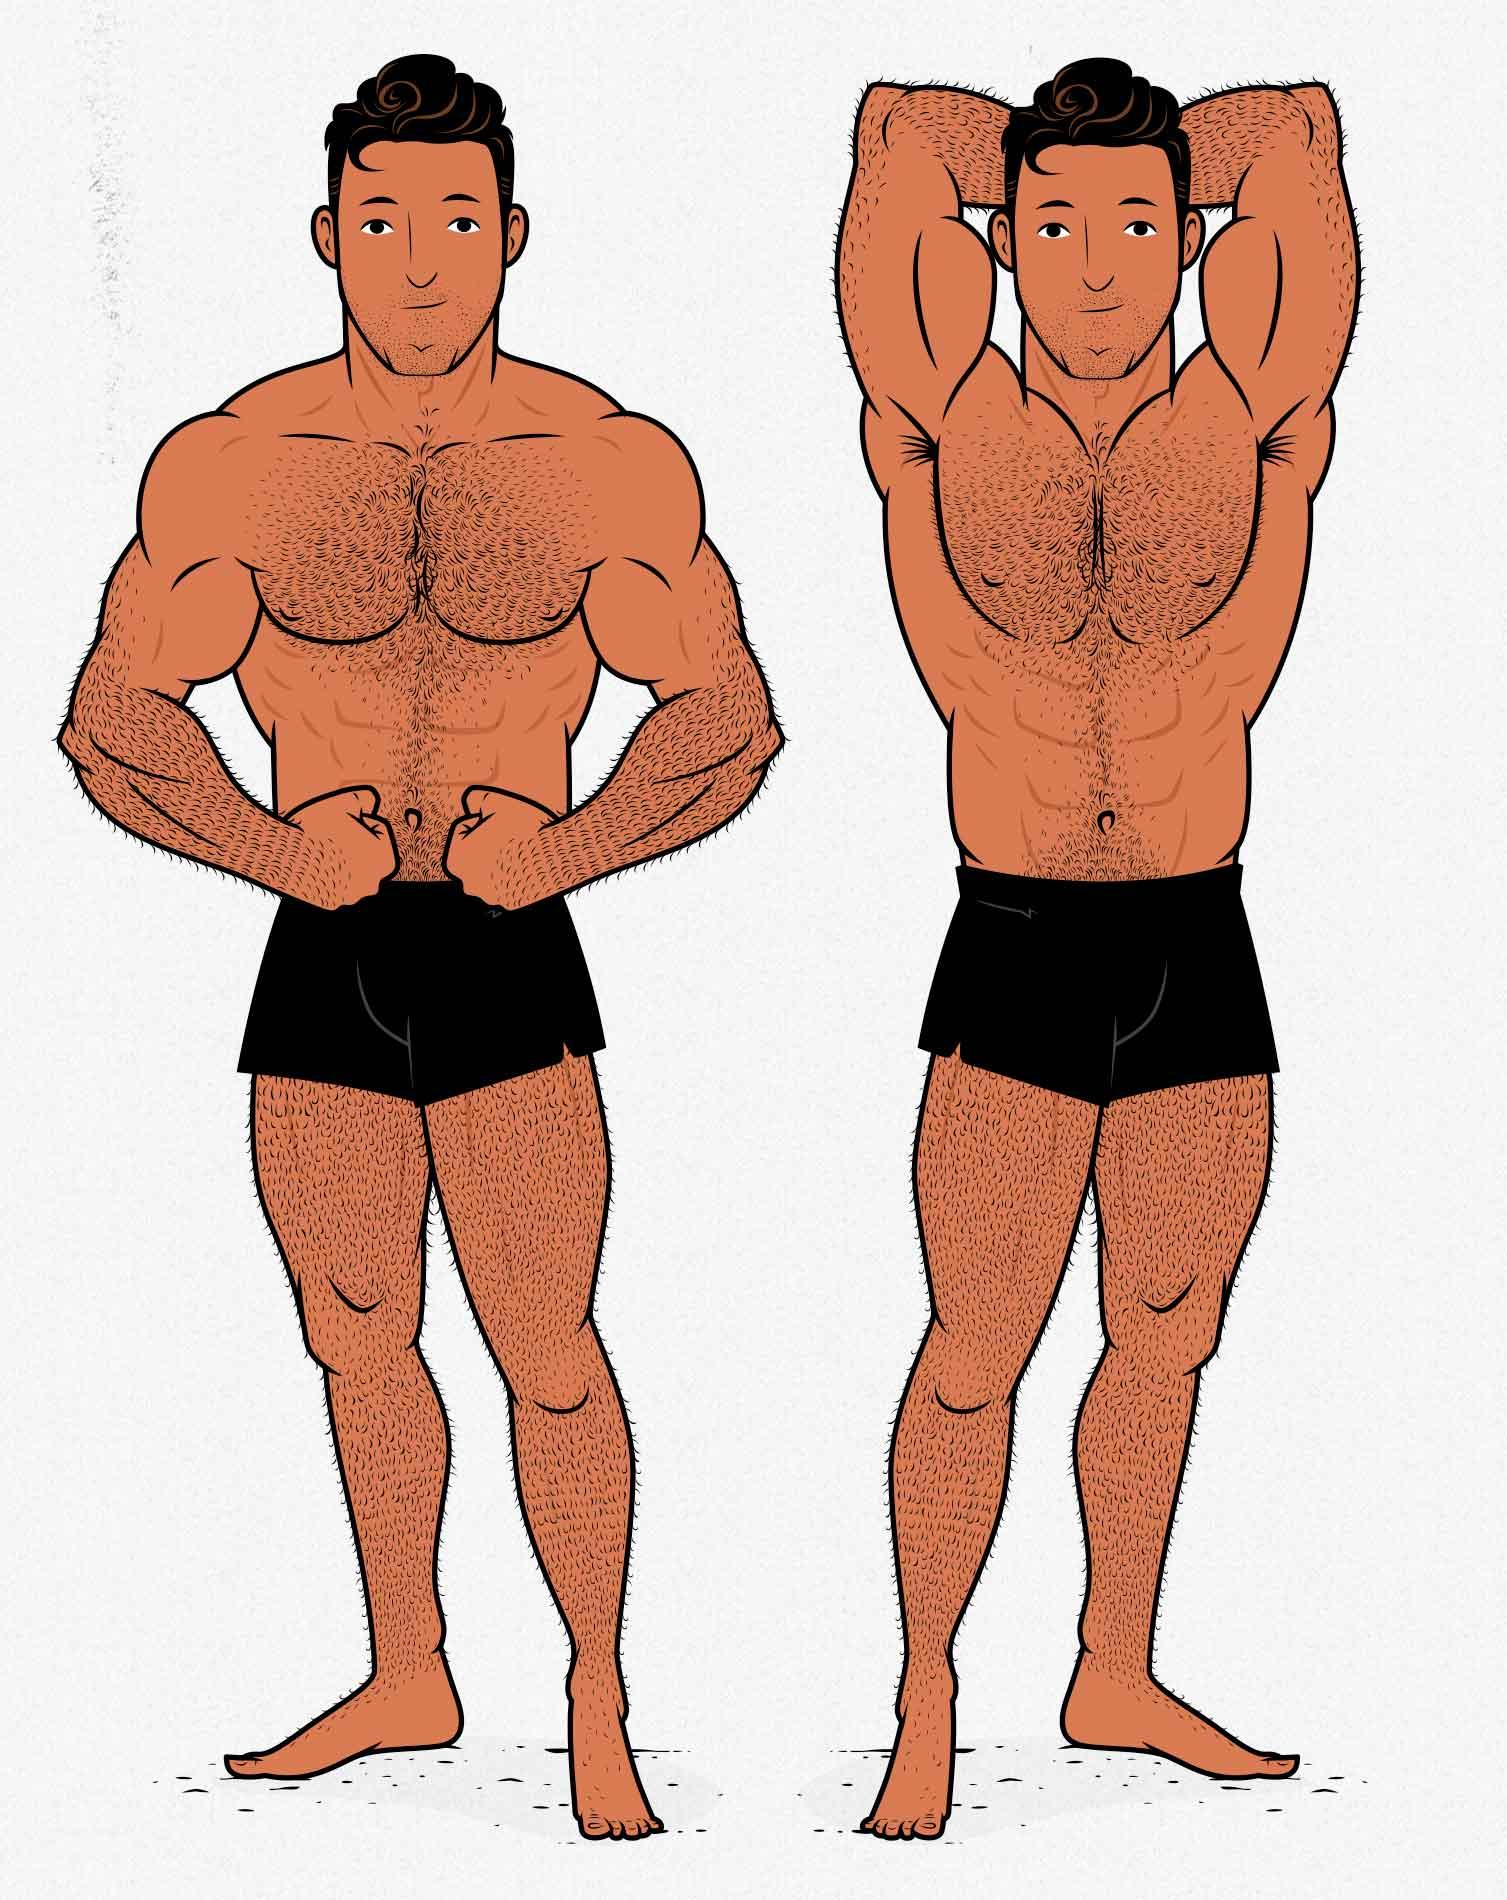 Illustration of the Bony to Beastly skinny bodybuilder flexing.